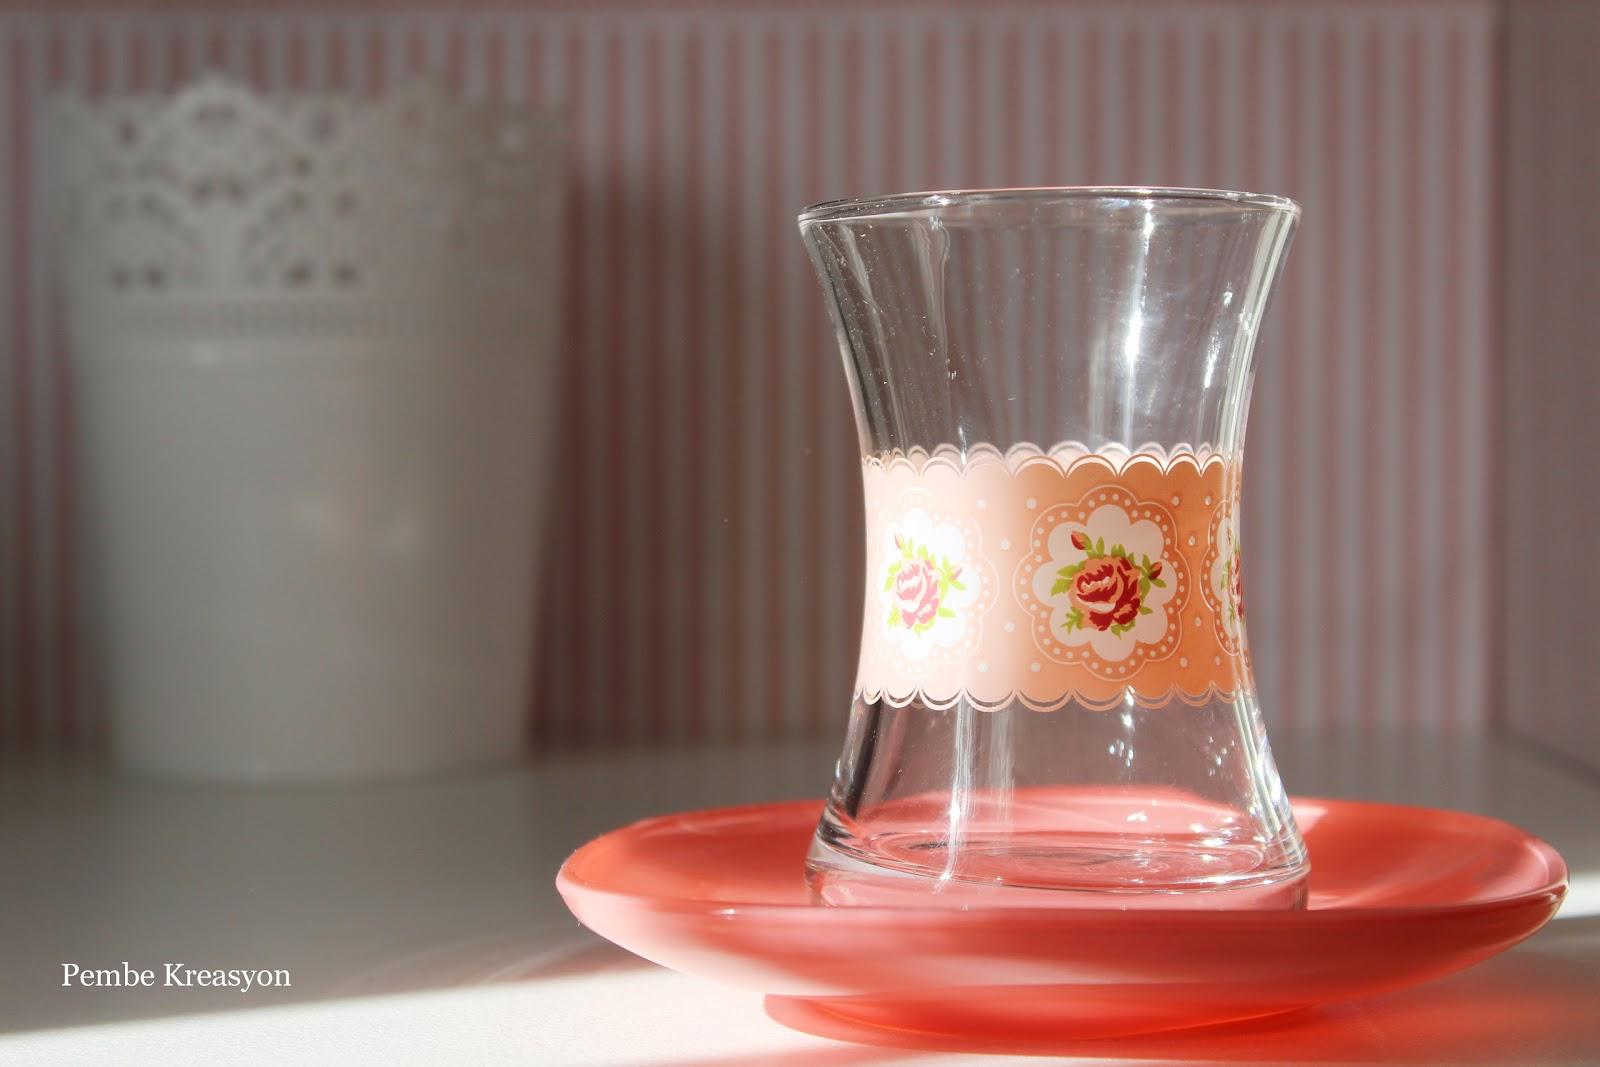 shabby chic tarzı nedir? laz gül desenli çay bardağı seti, çeyiz bloğu